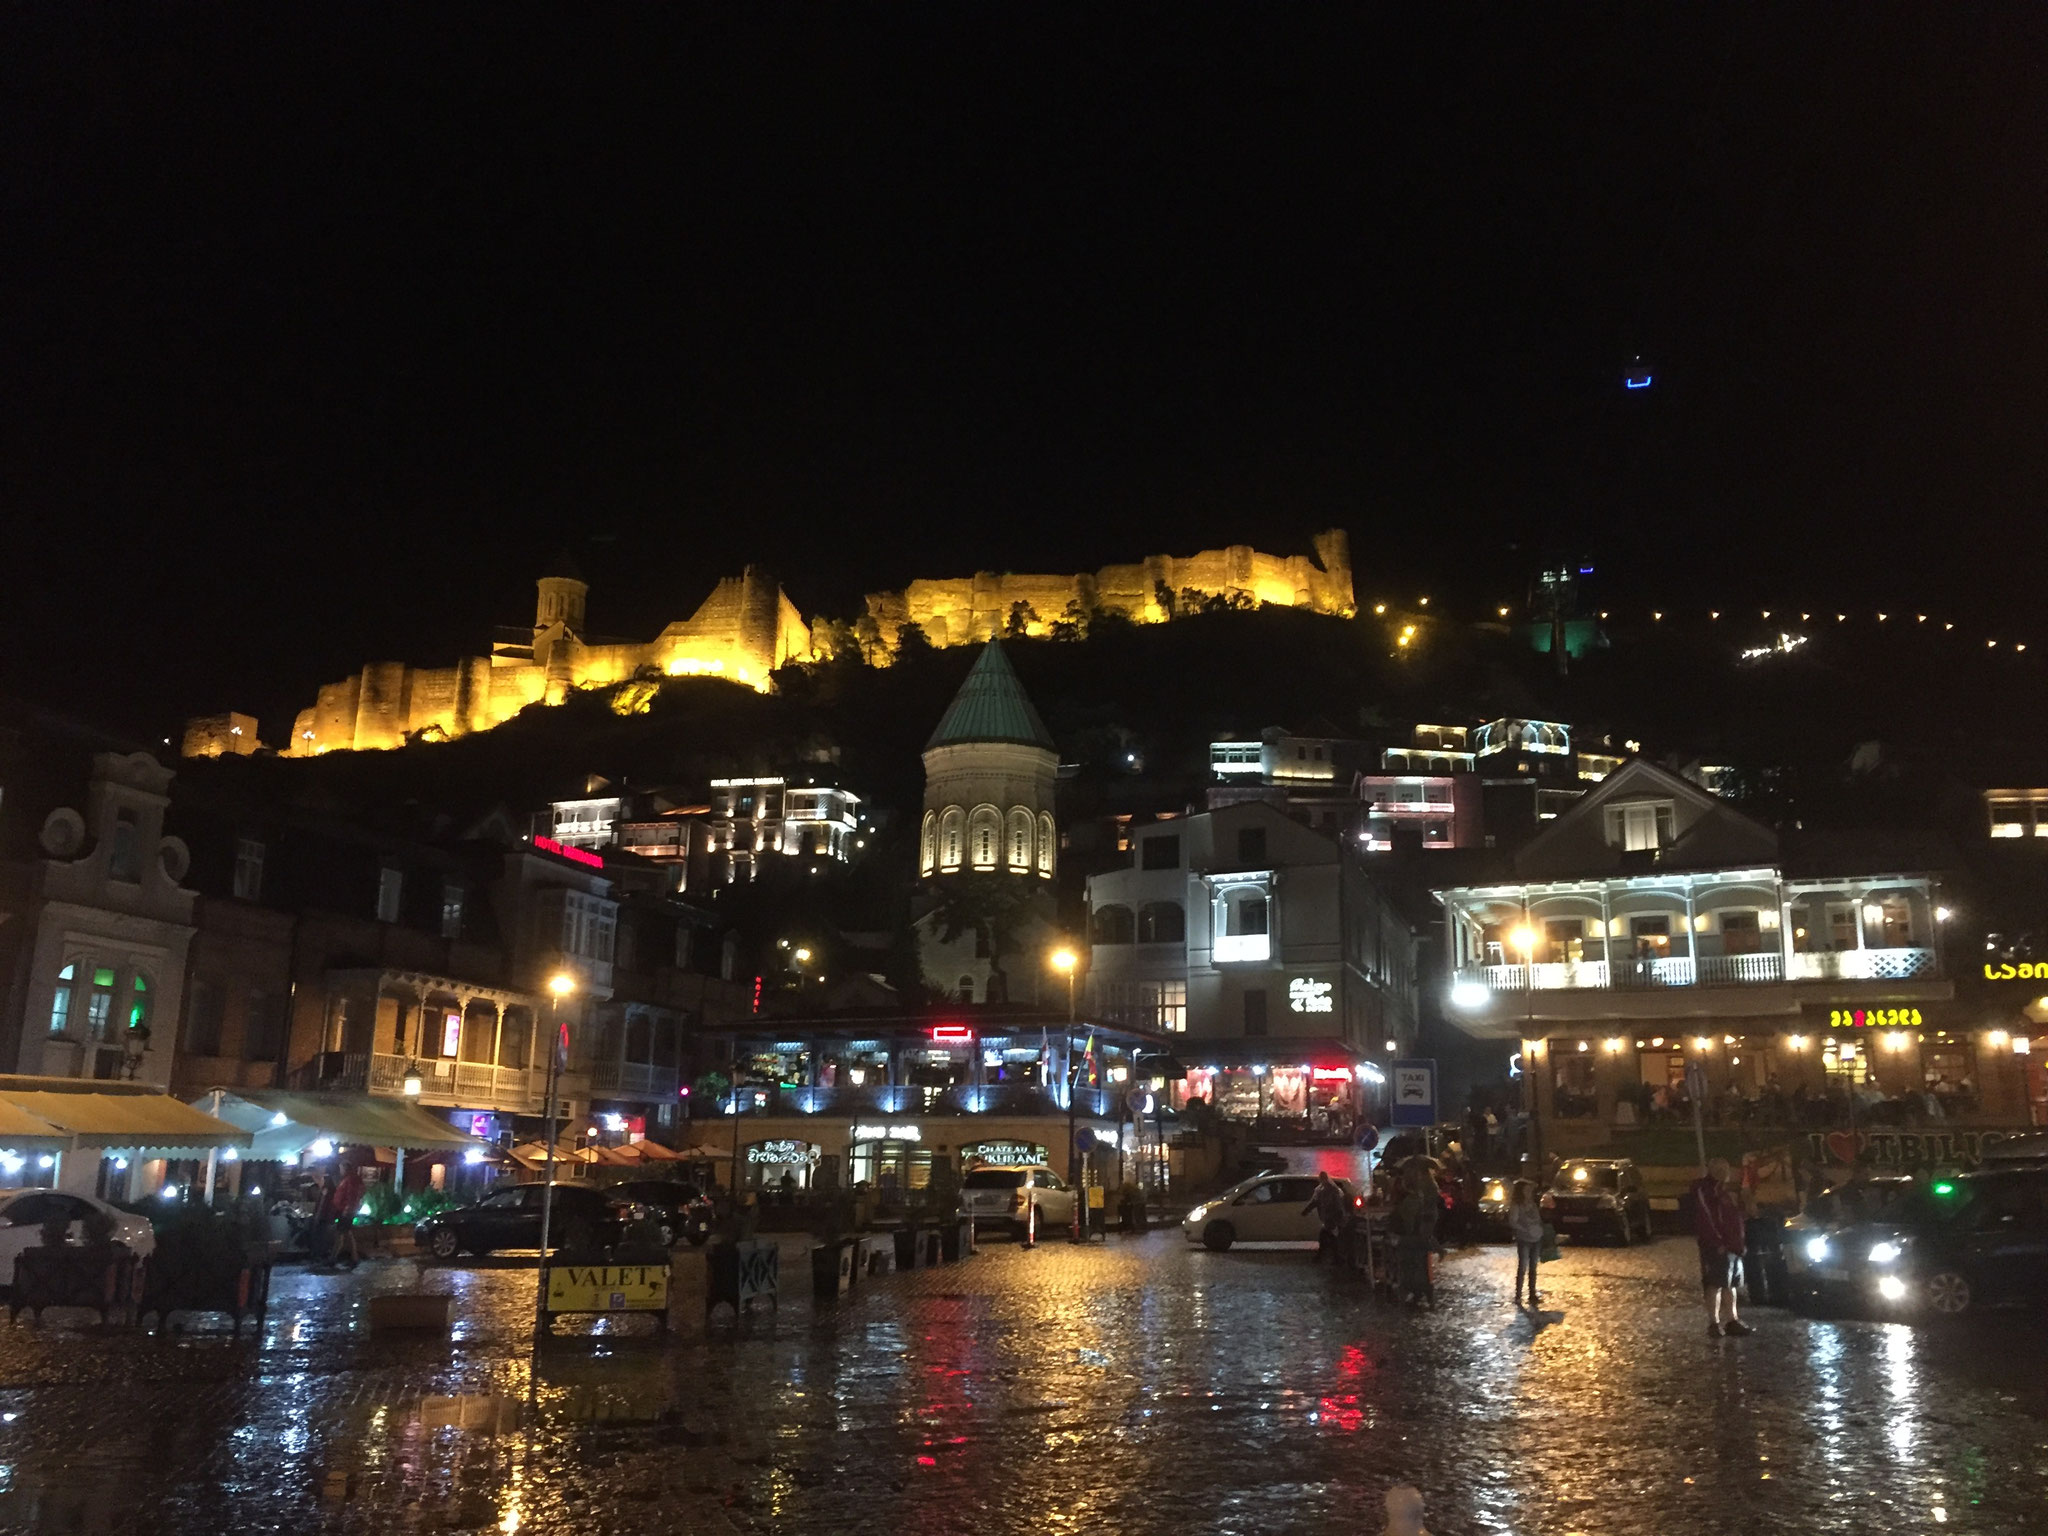 Narikala Festung in Tiflis bei Nacht